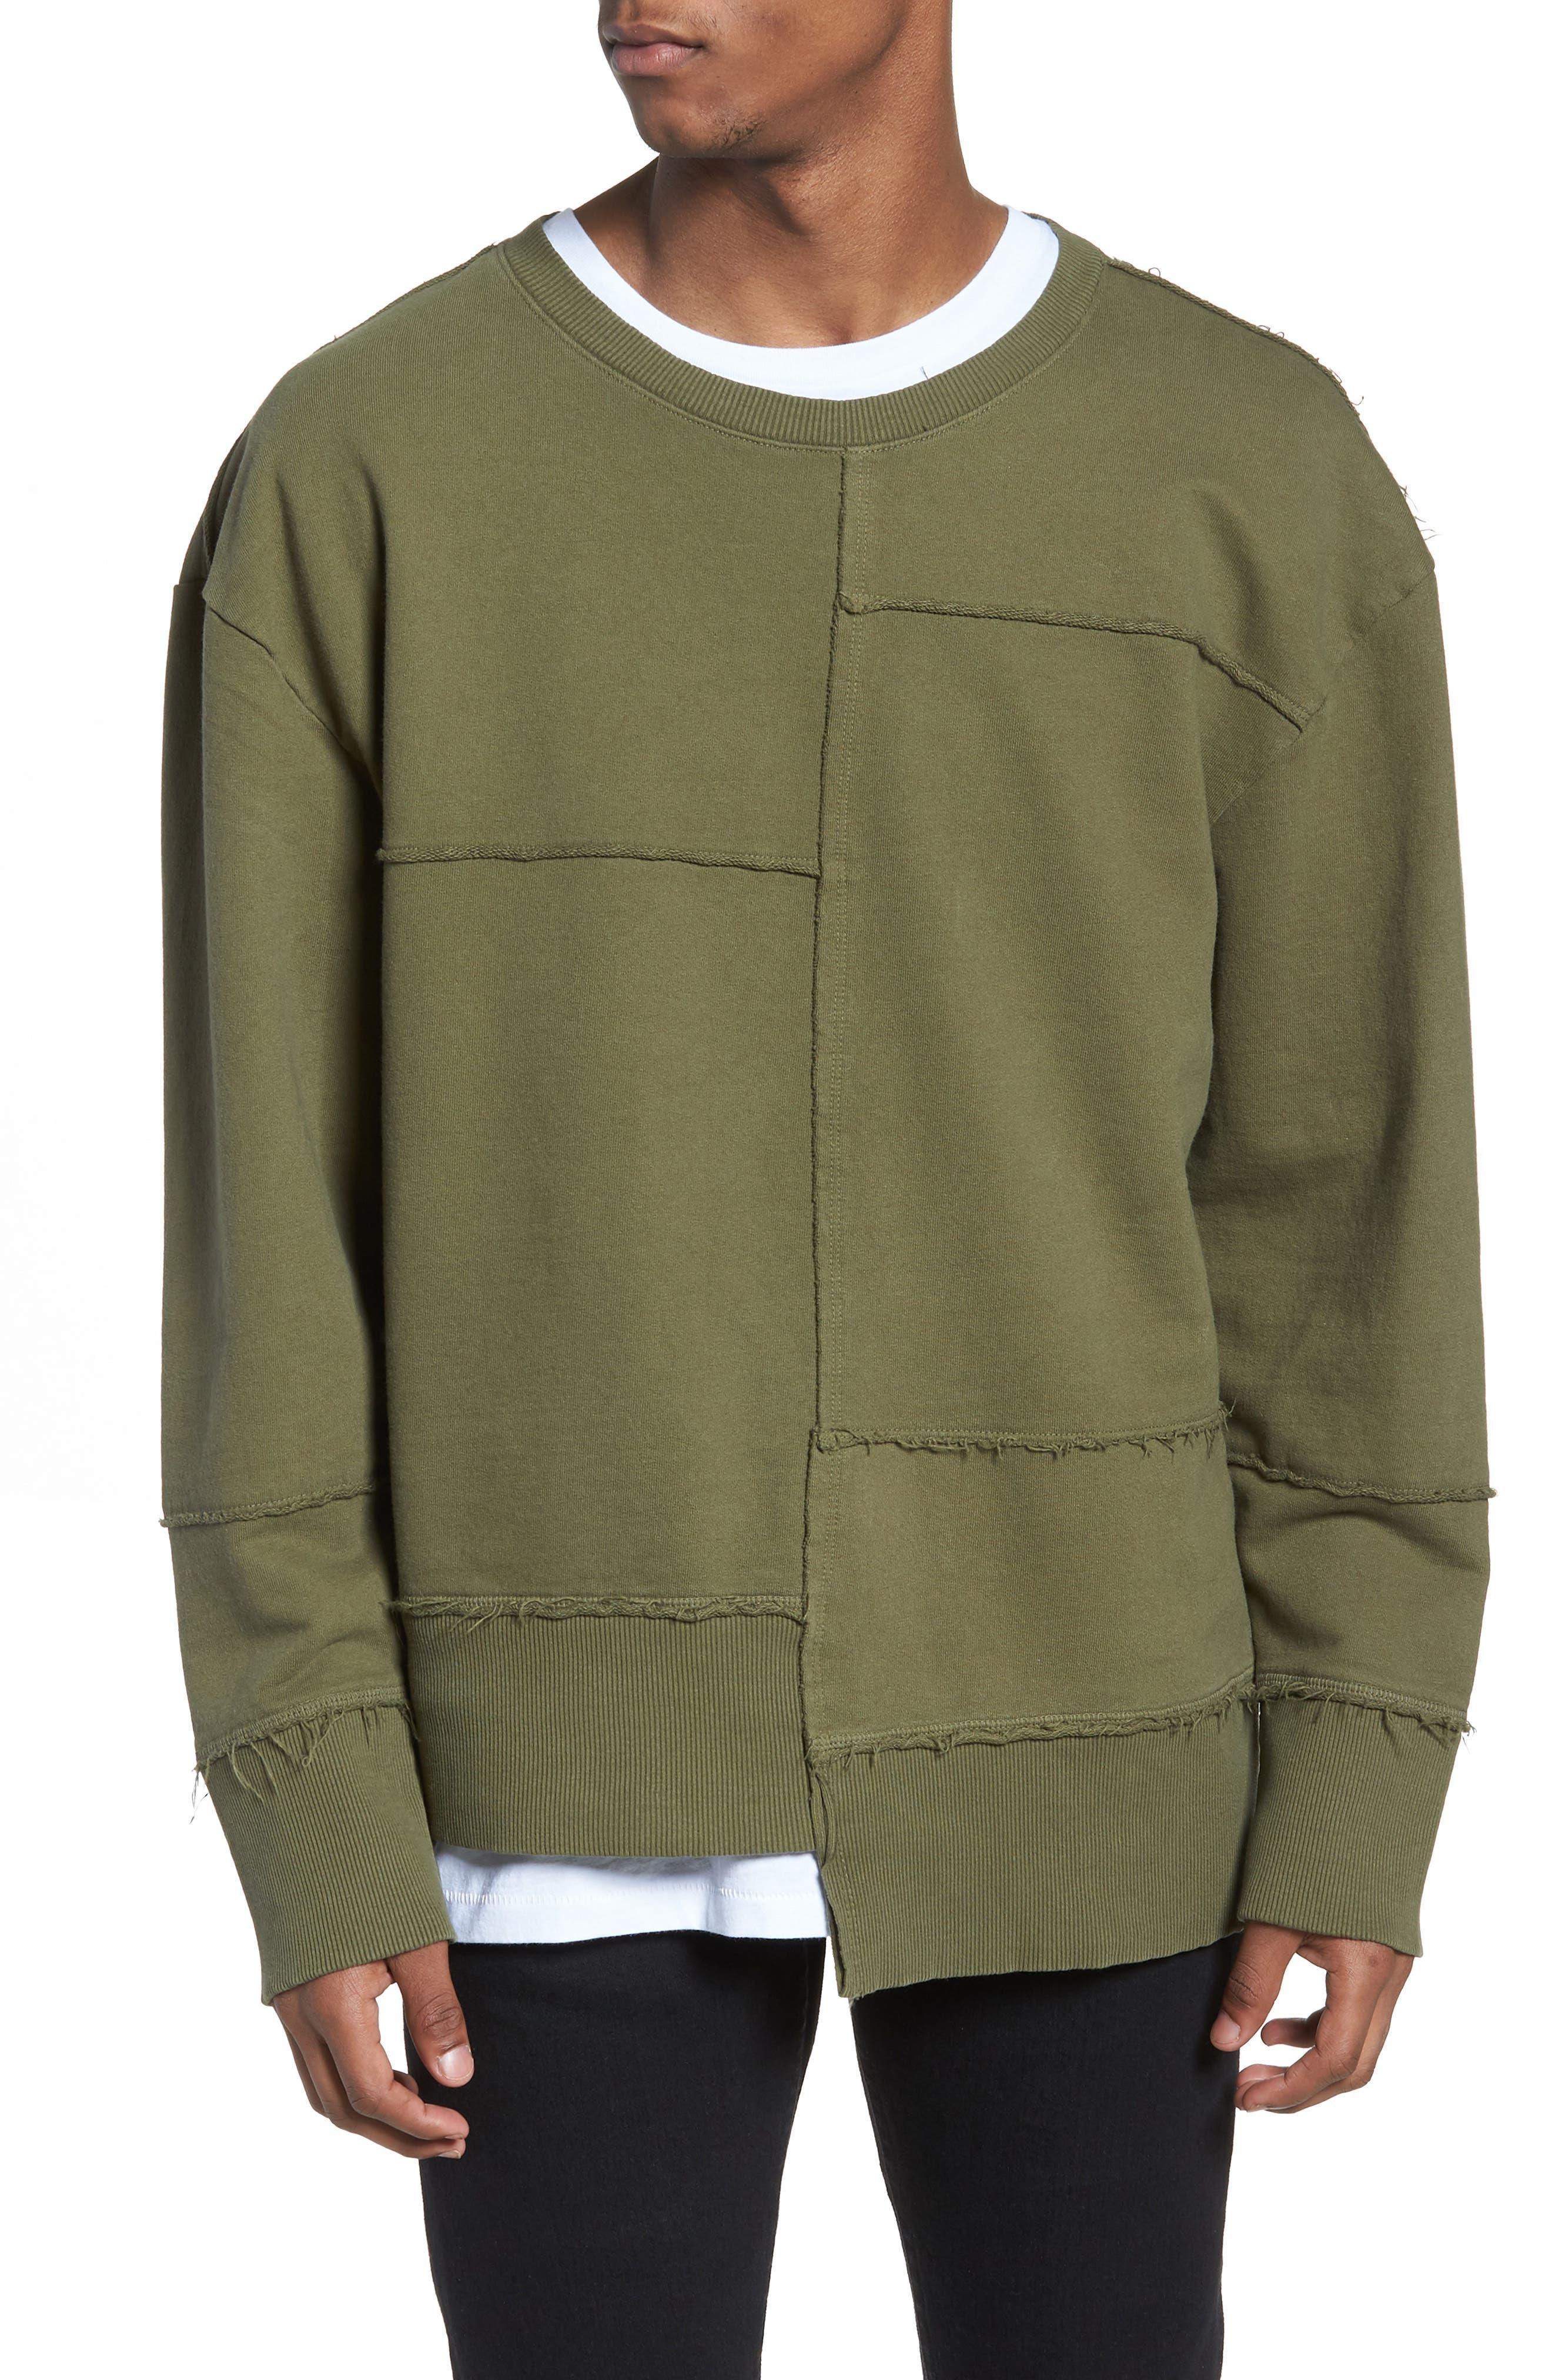 Splice Sweatshirt,                             Main thumbnail 1, color,                             311